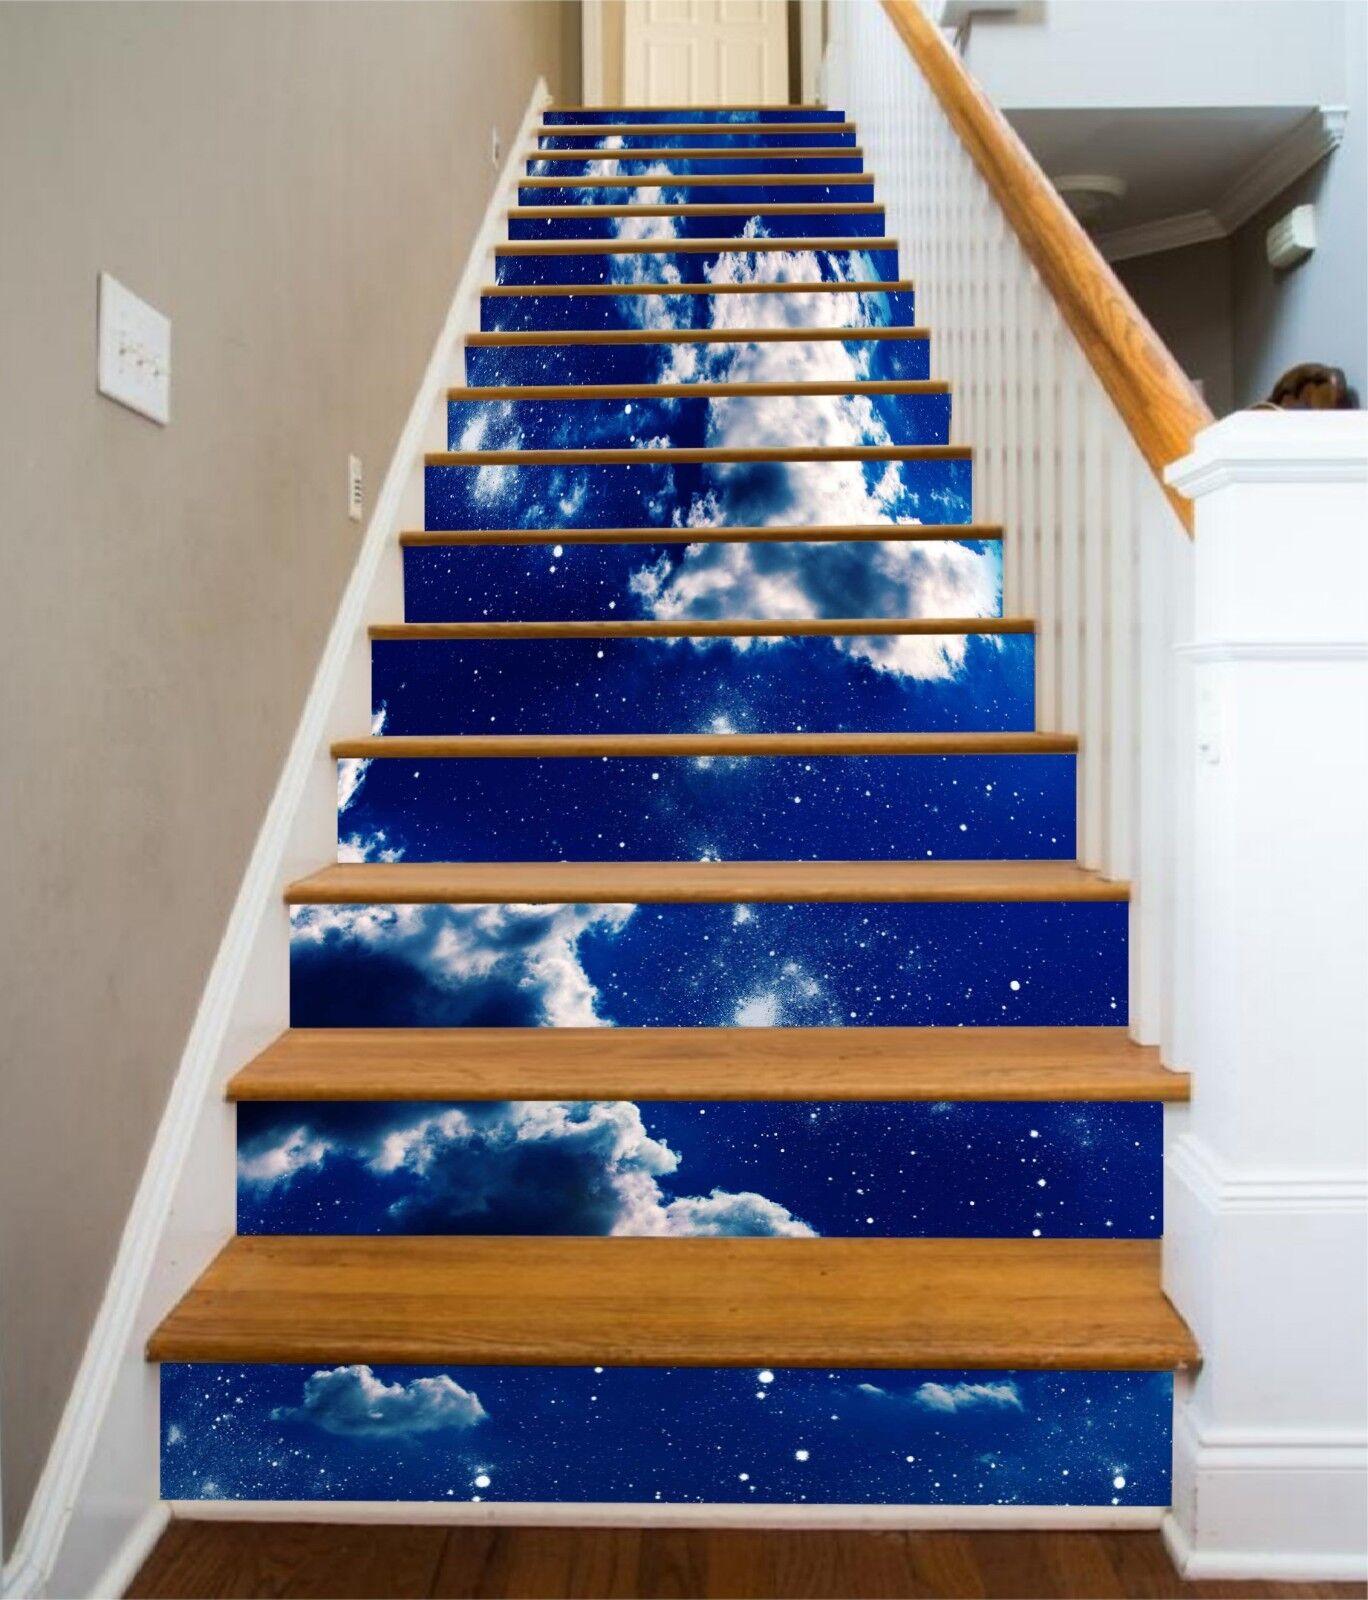 3D Bule Sky 3 Stair Risers Decoration Photo Mural Vinyl Decal Wallpaper CA